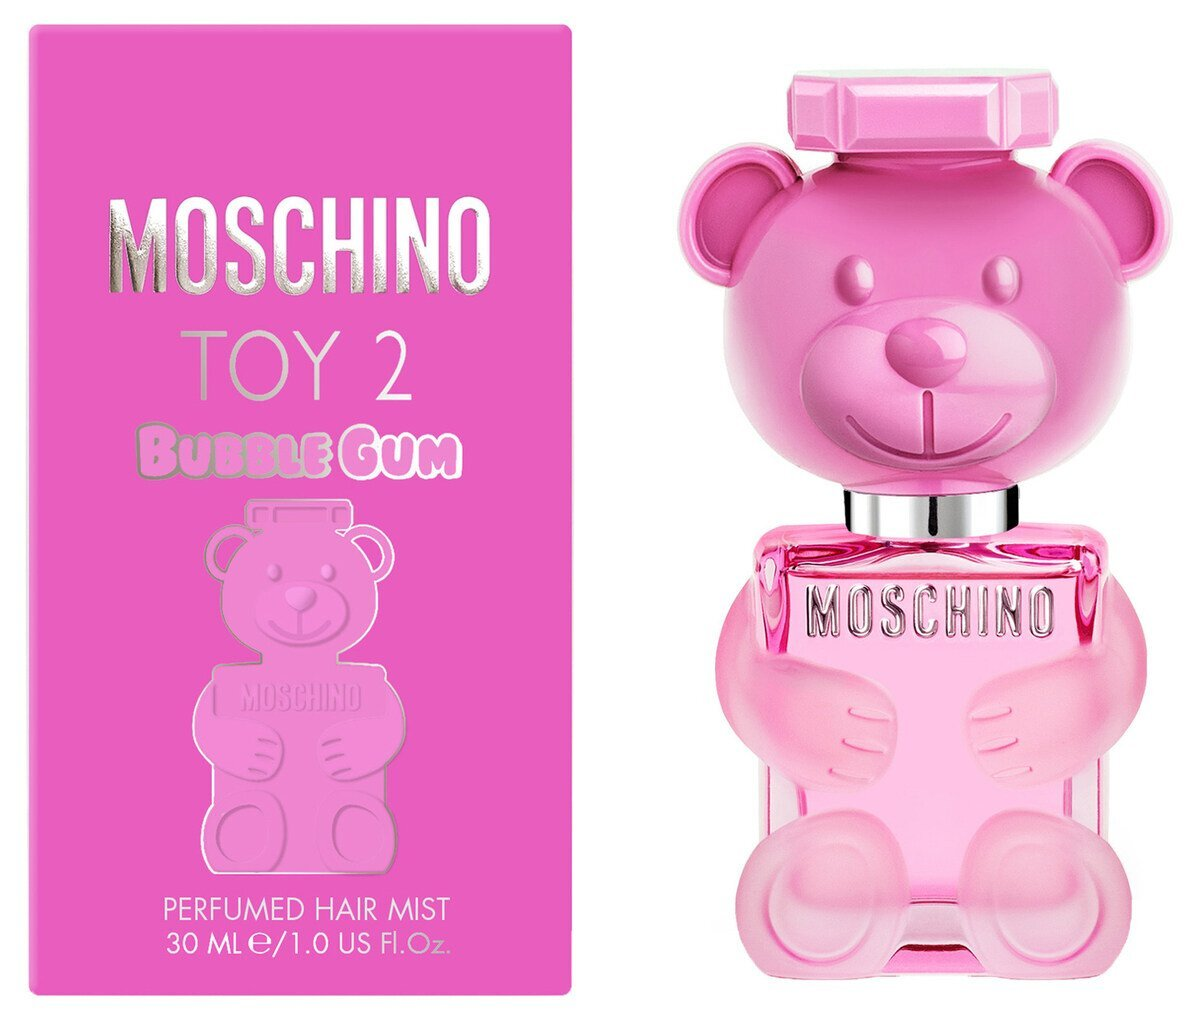 Дымка для волос 30 мл Moschino Toy 2 Bubble Gum